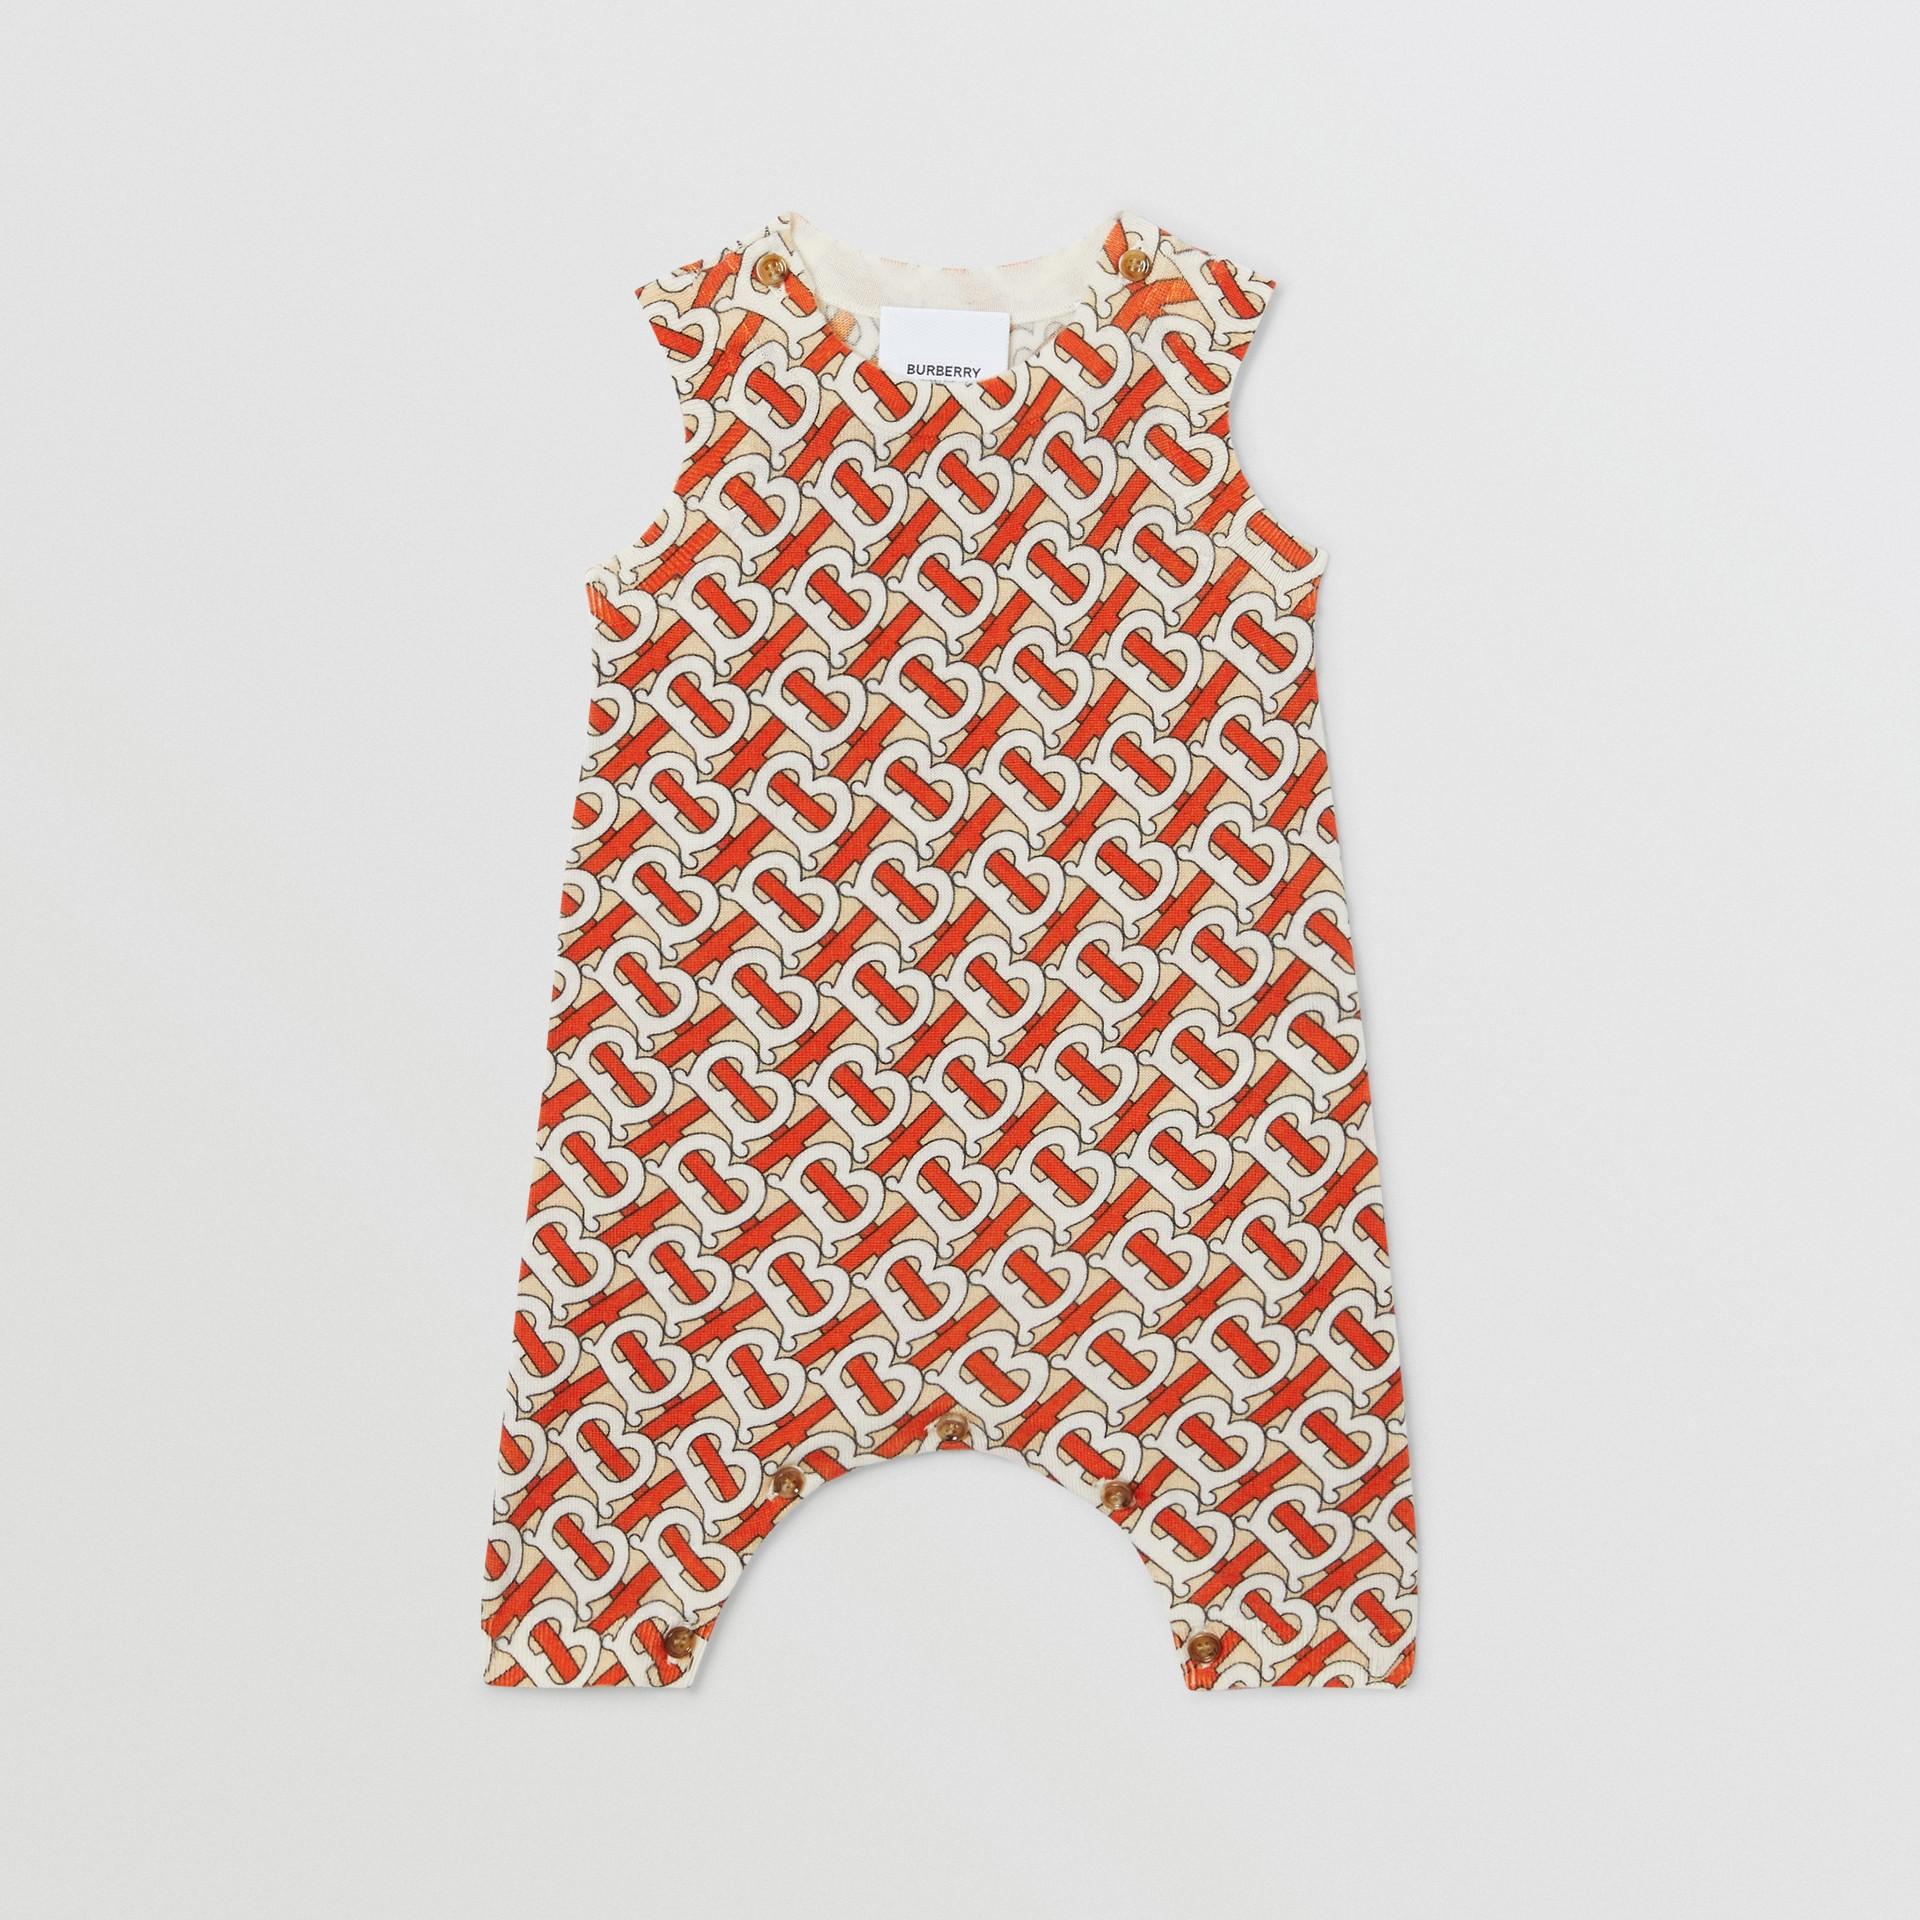 Monogram Print Merino Wool Two-piece Baby Gift Set in Vermilion - Children | Burberry - gallery image 3